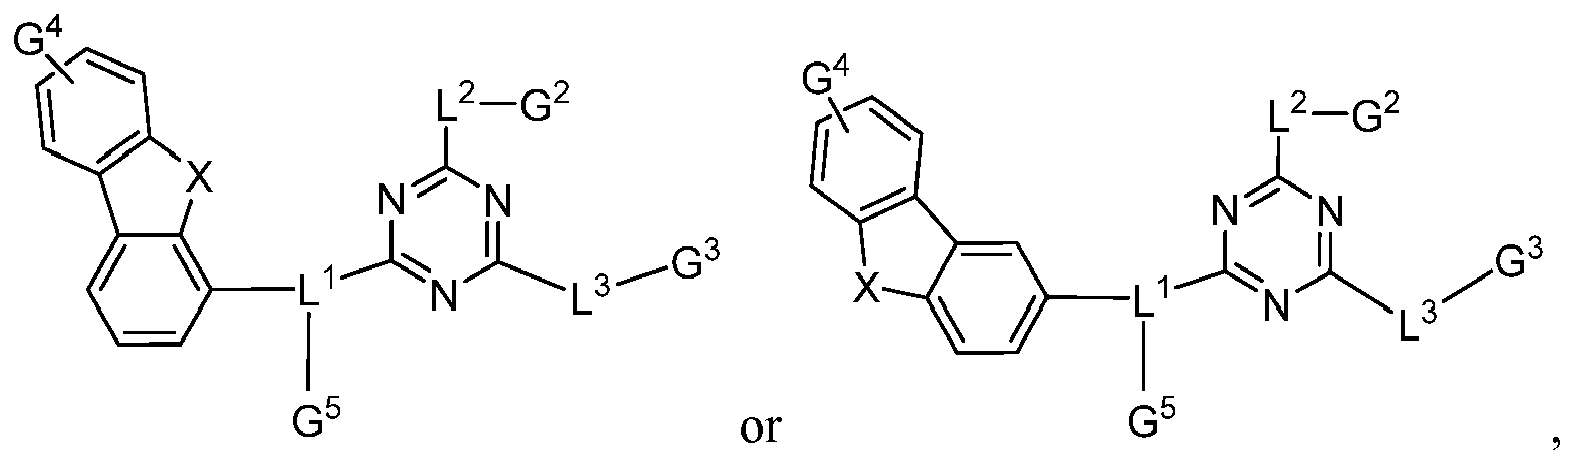 Figure imgb0571